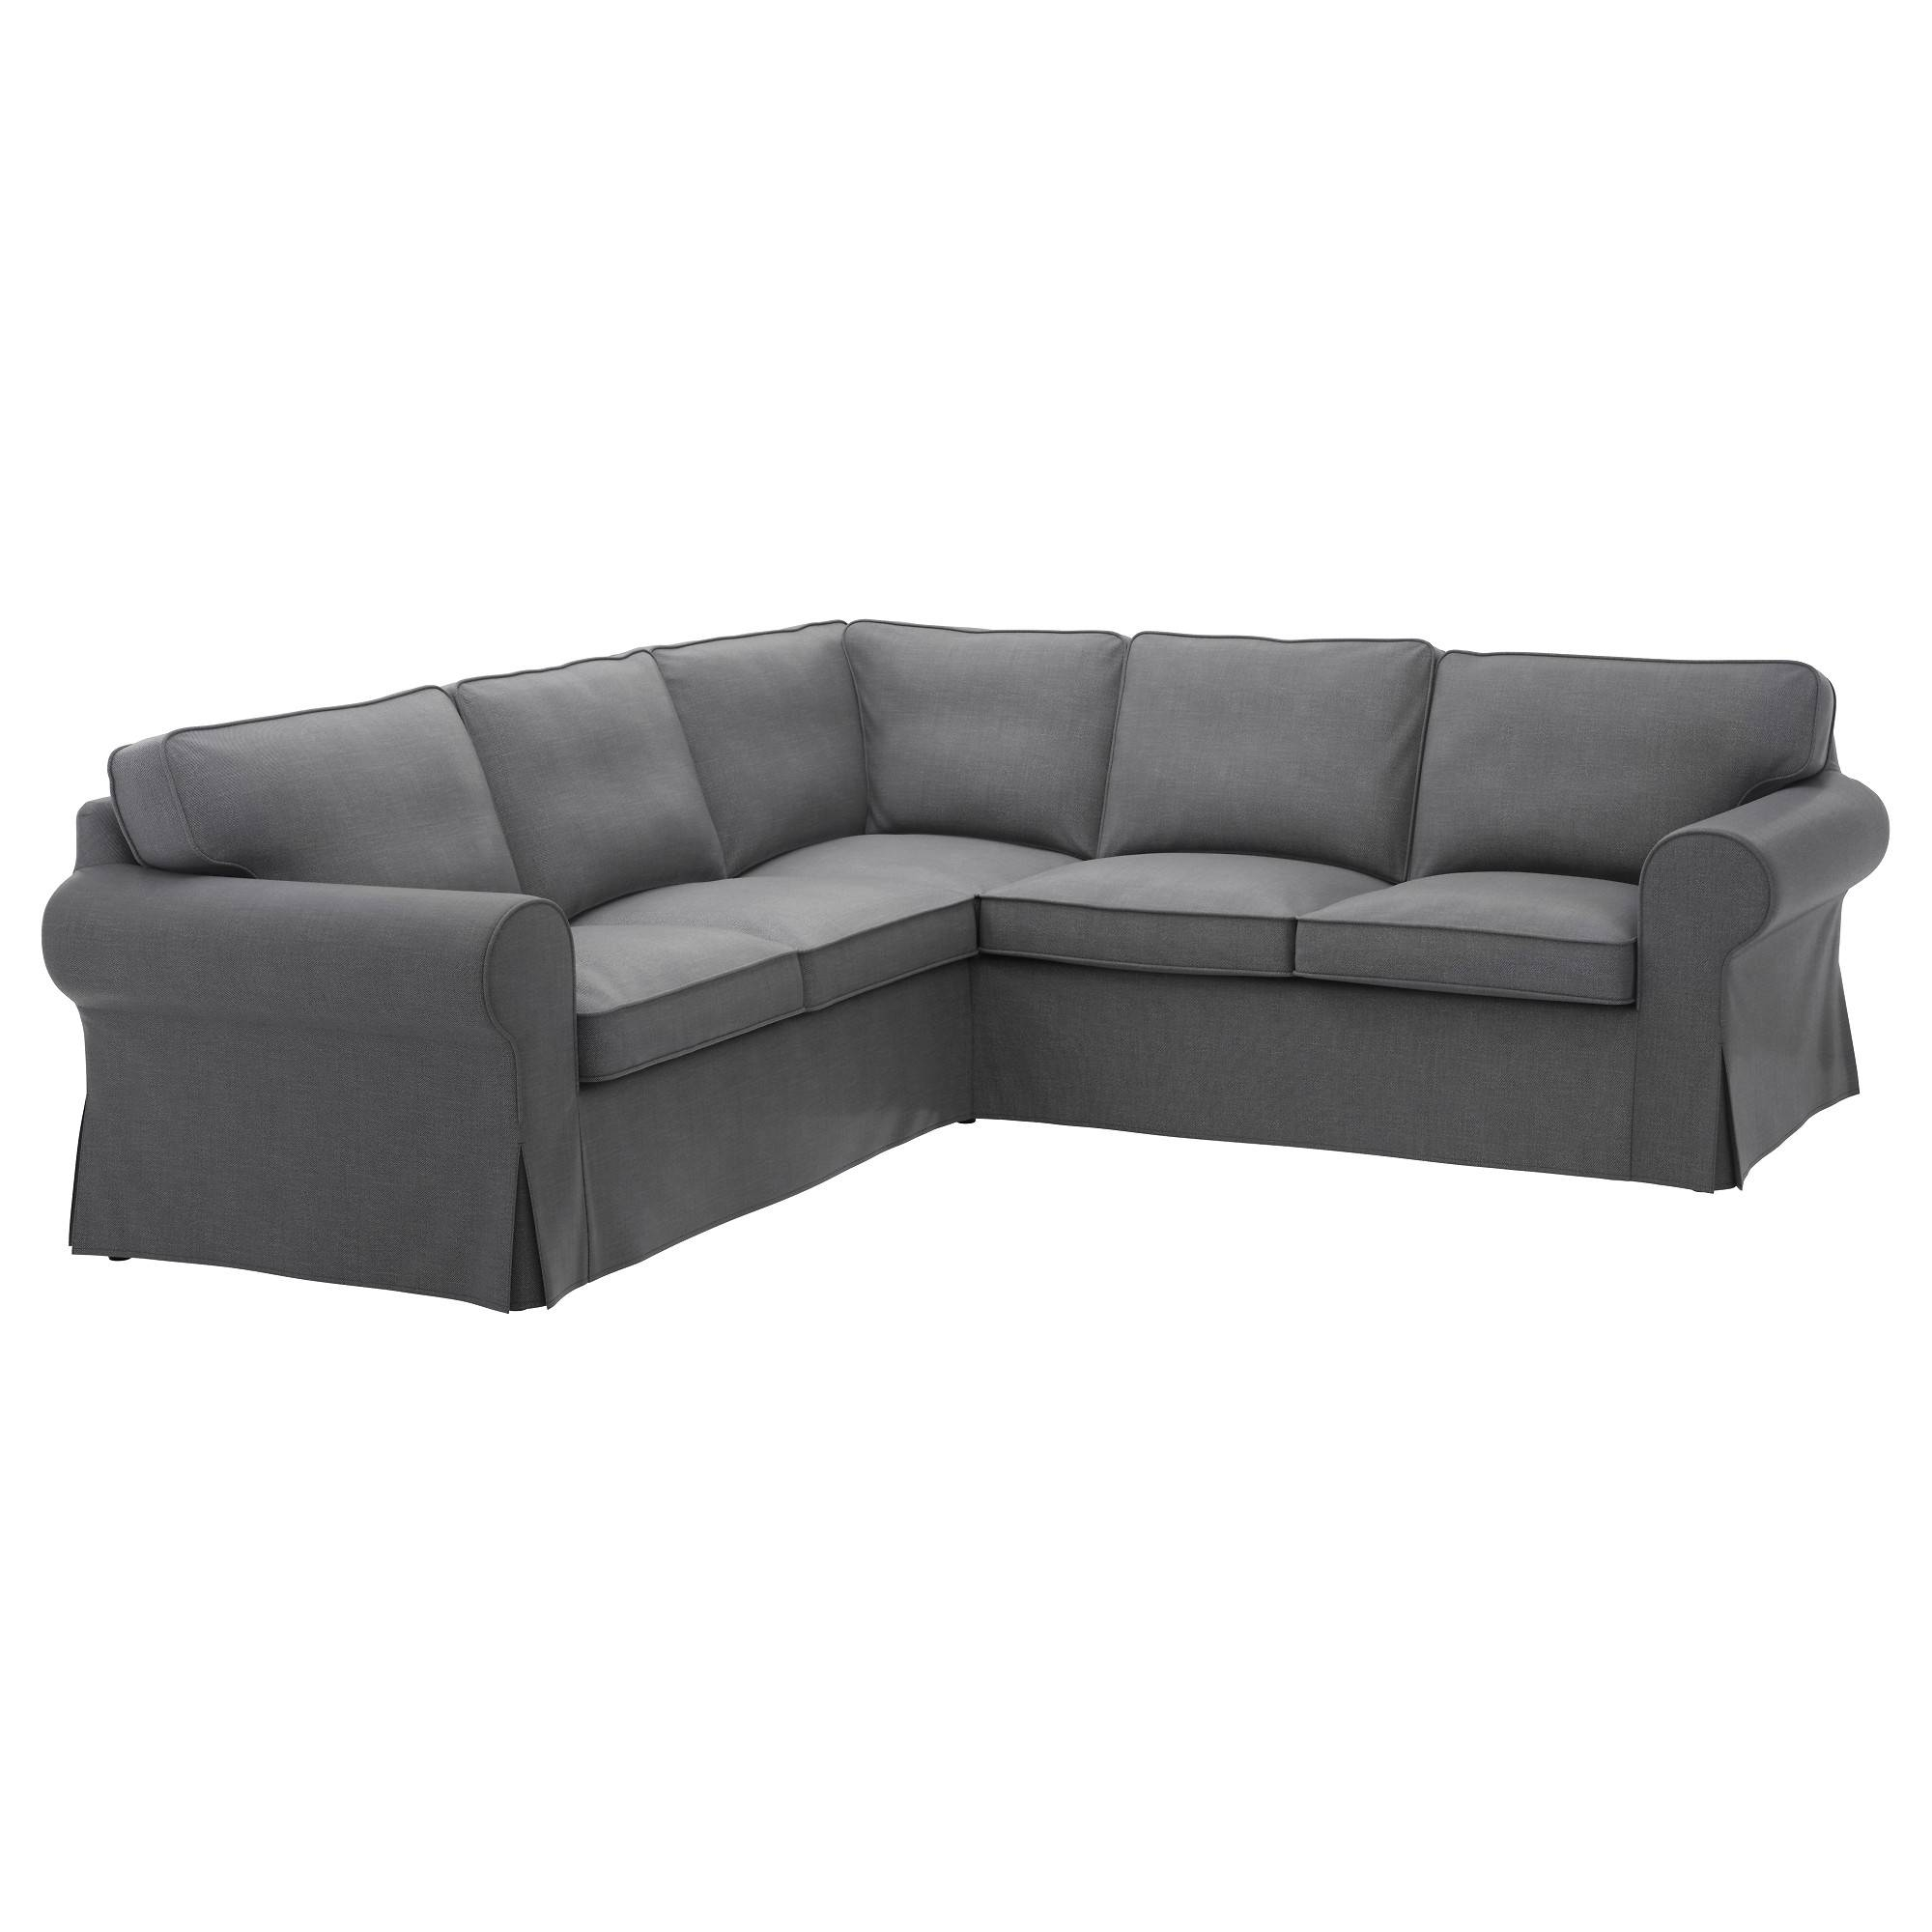 Fabric Sofas - Modern & Contemporary - Ikea pertaining to White Fabric Sofas (Image 11 of 30)